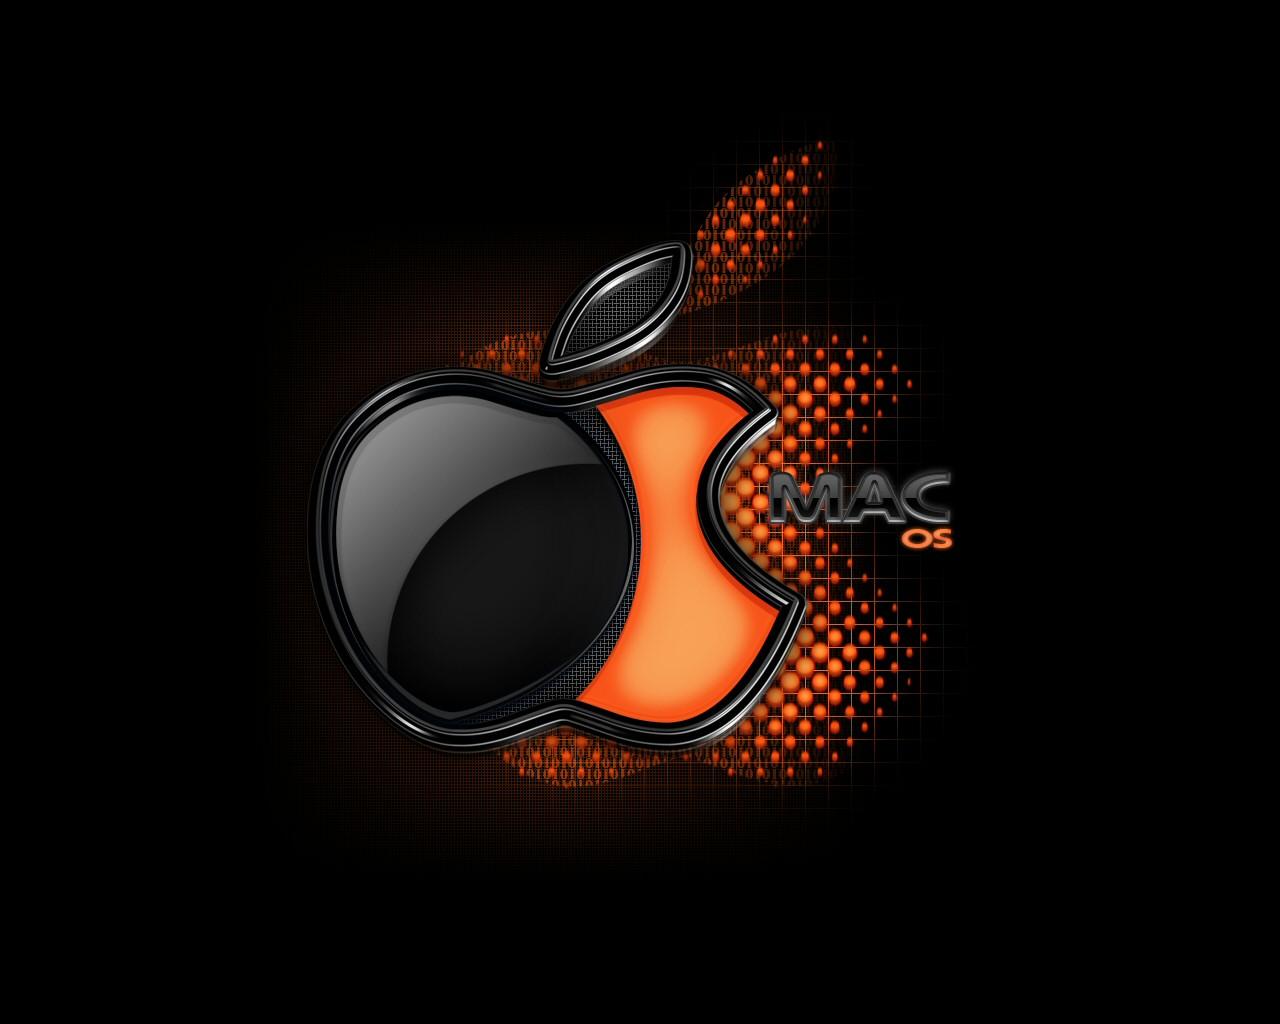 Mac IMac Desktop Wallpapers HD Free 1280x1024